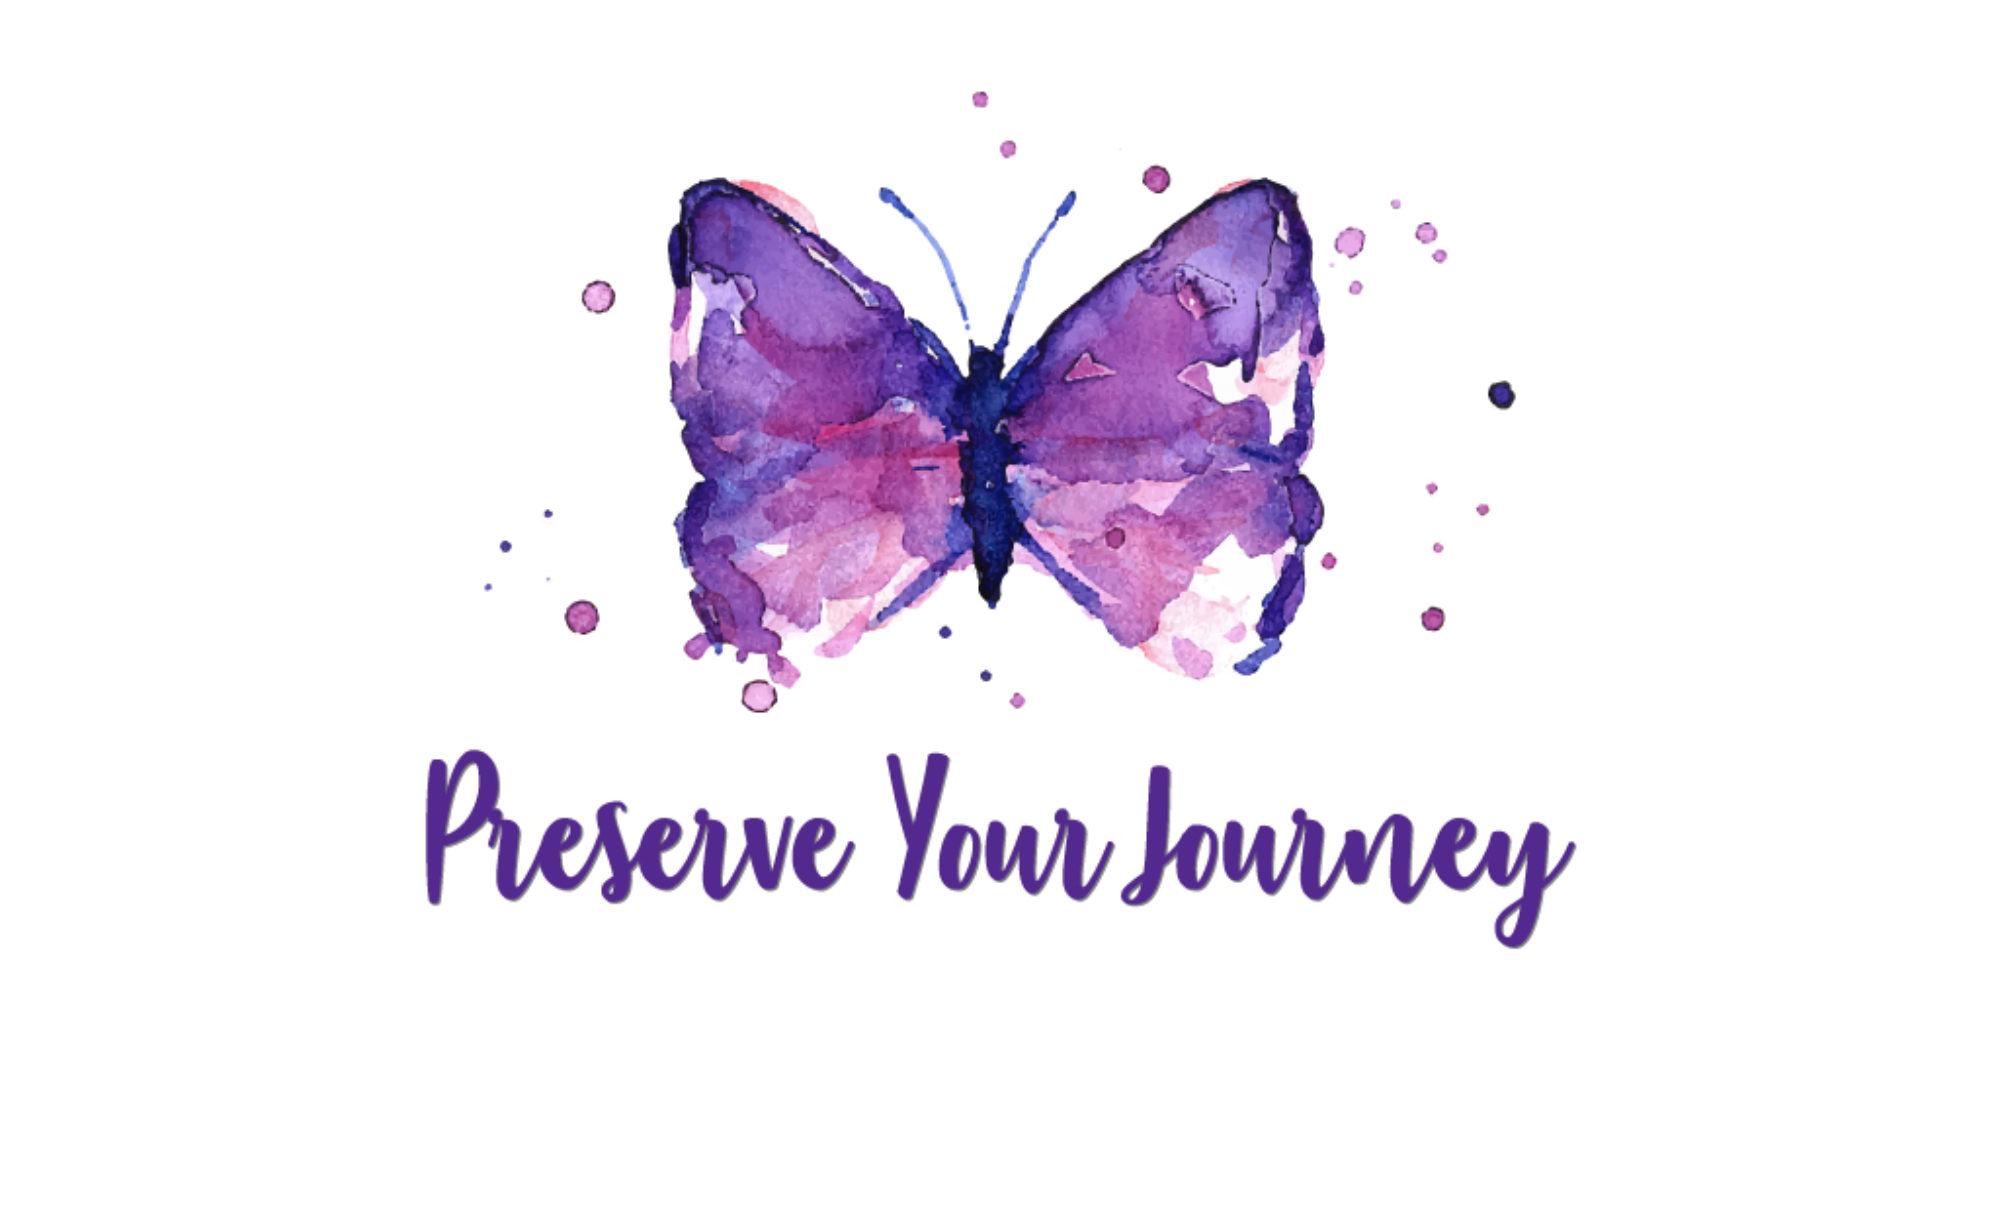 Preserve Your Journey